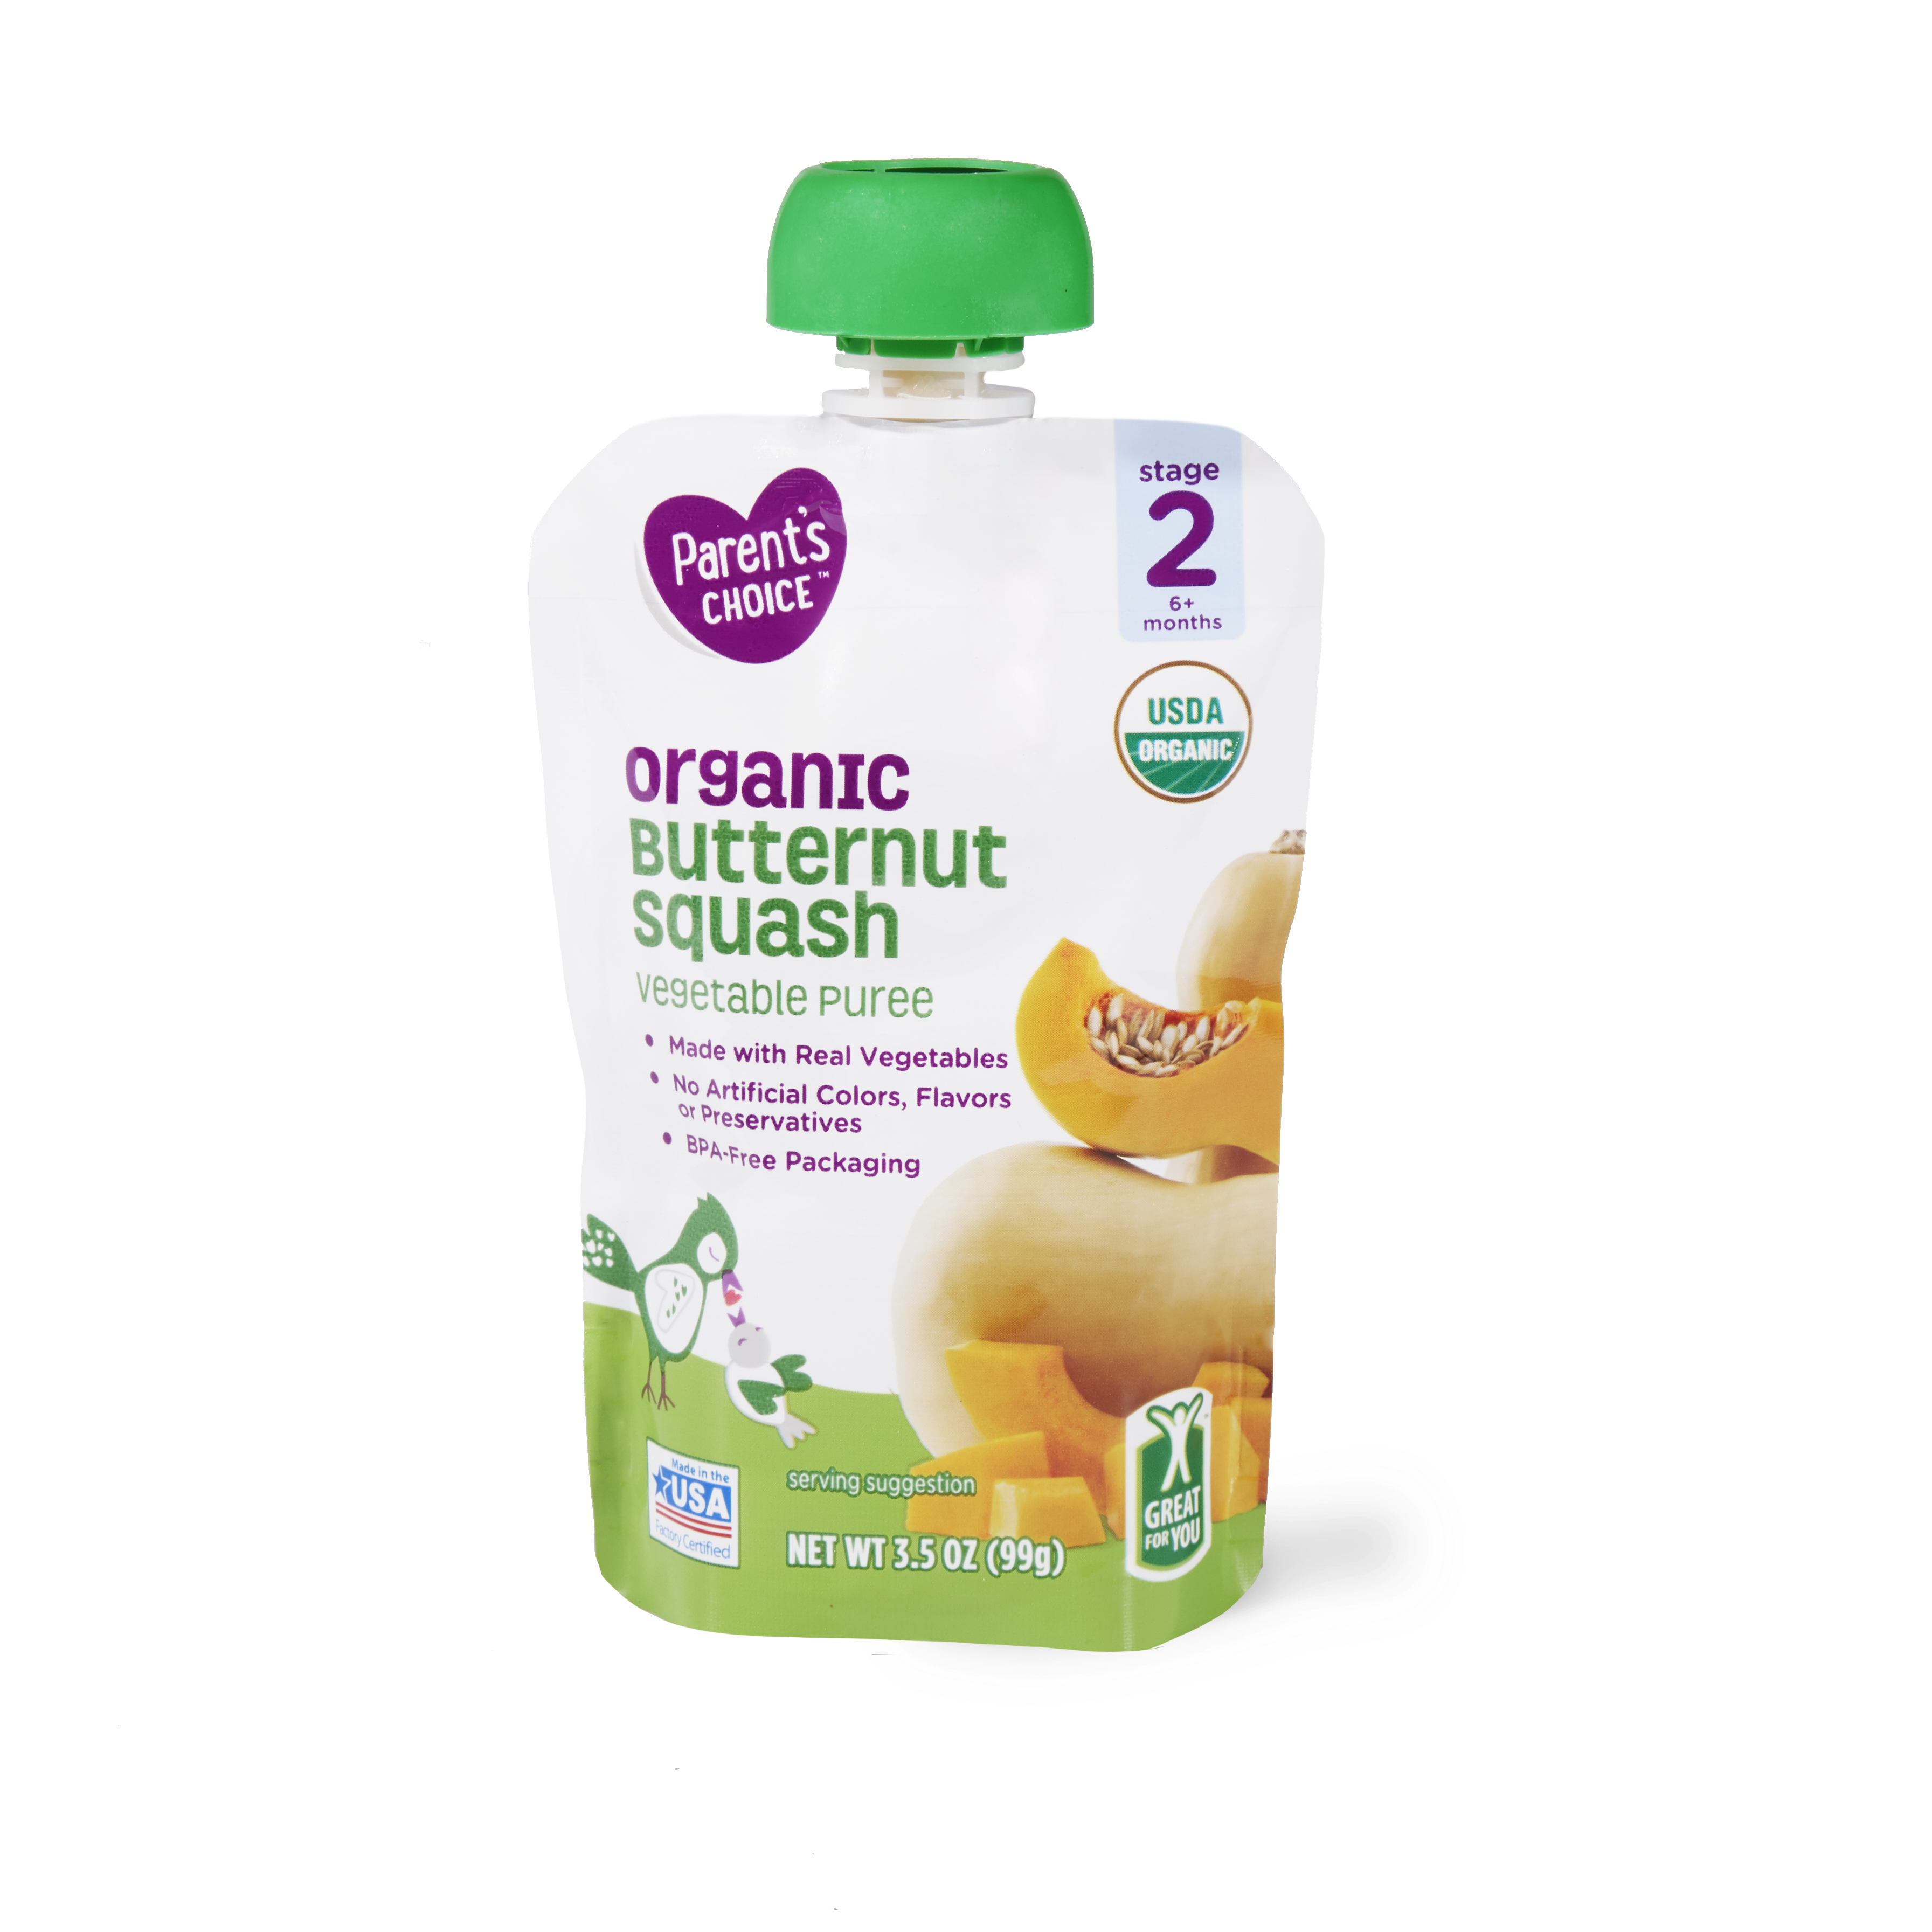 Parent's Choice Organic Butternut Squash, Stage 2, 3.5 oz Pouch